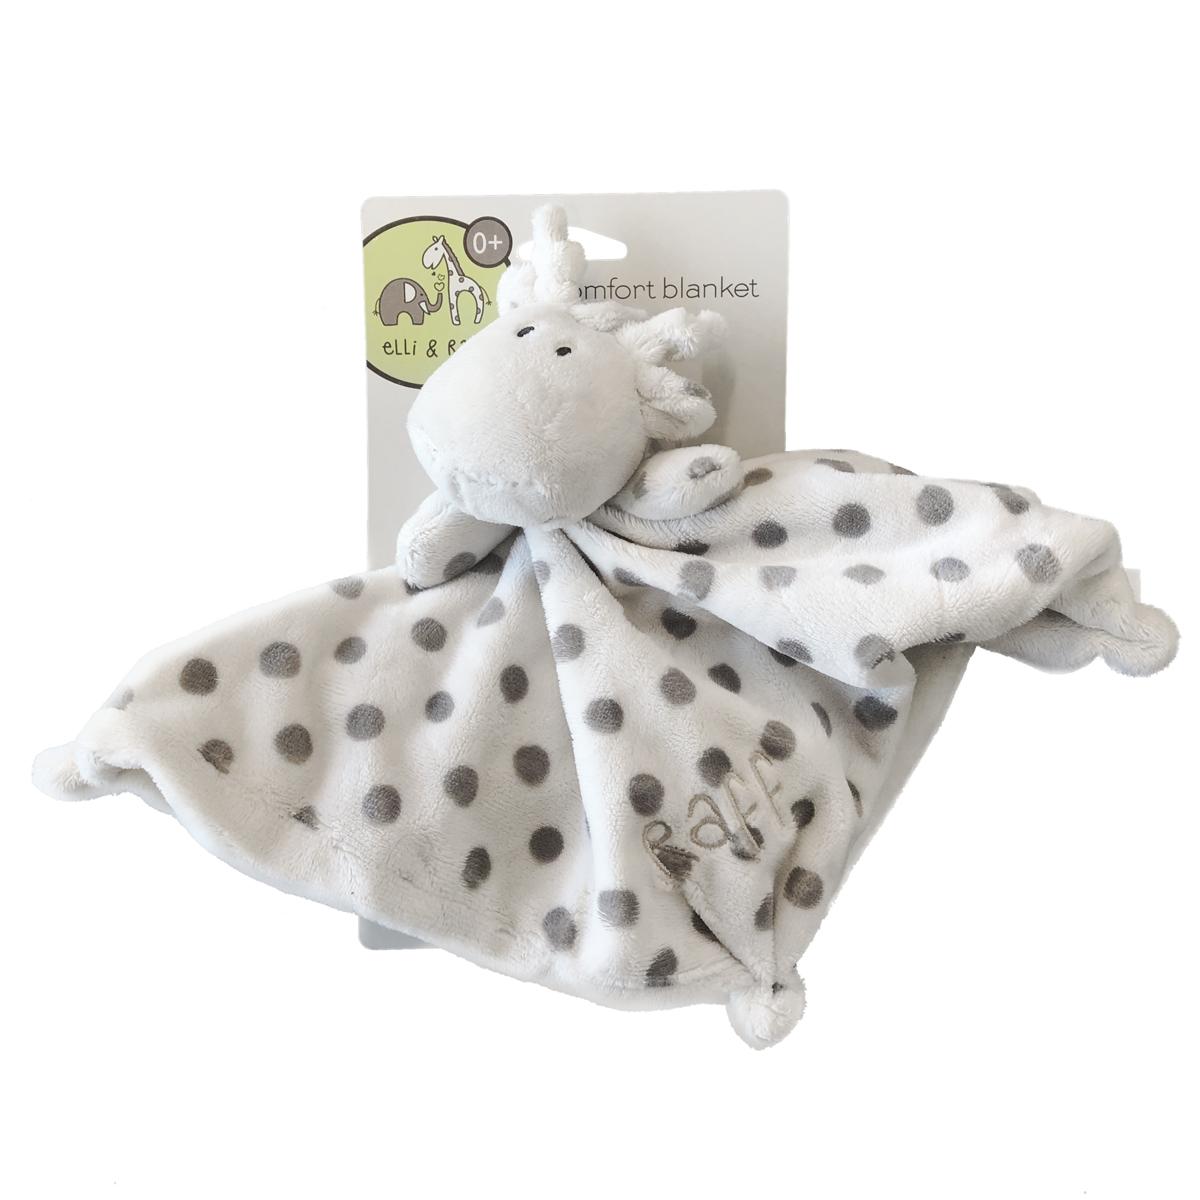 Grey Range ELLI Elli and Raff Comfort Blanket